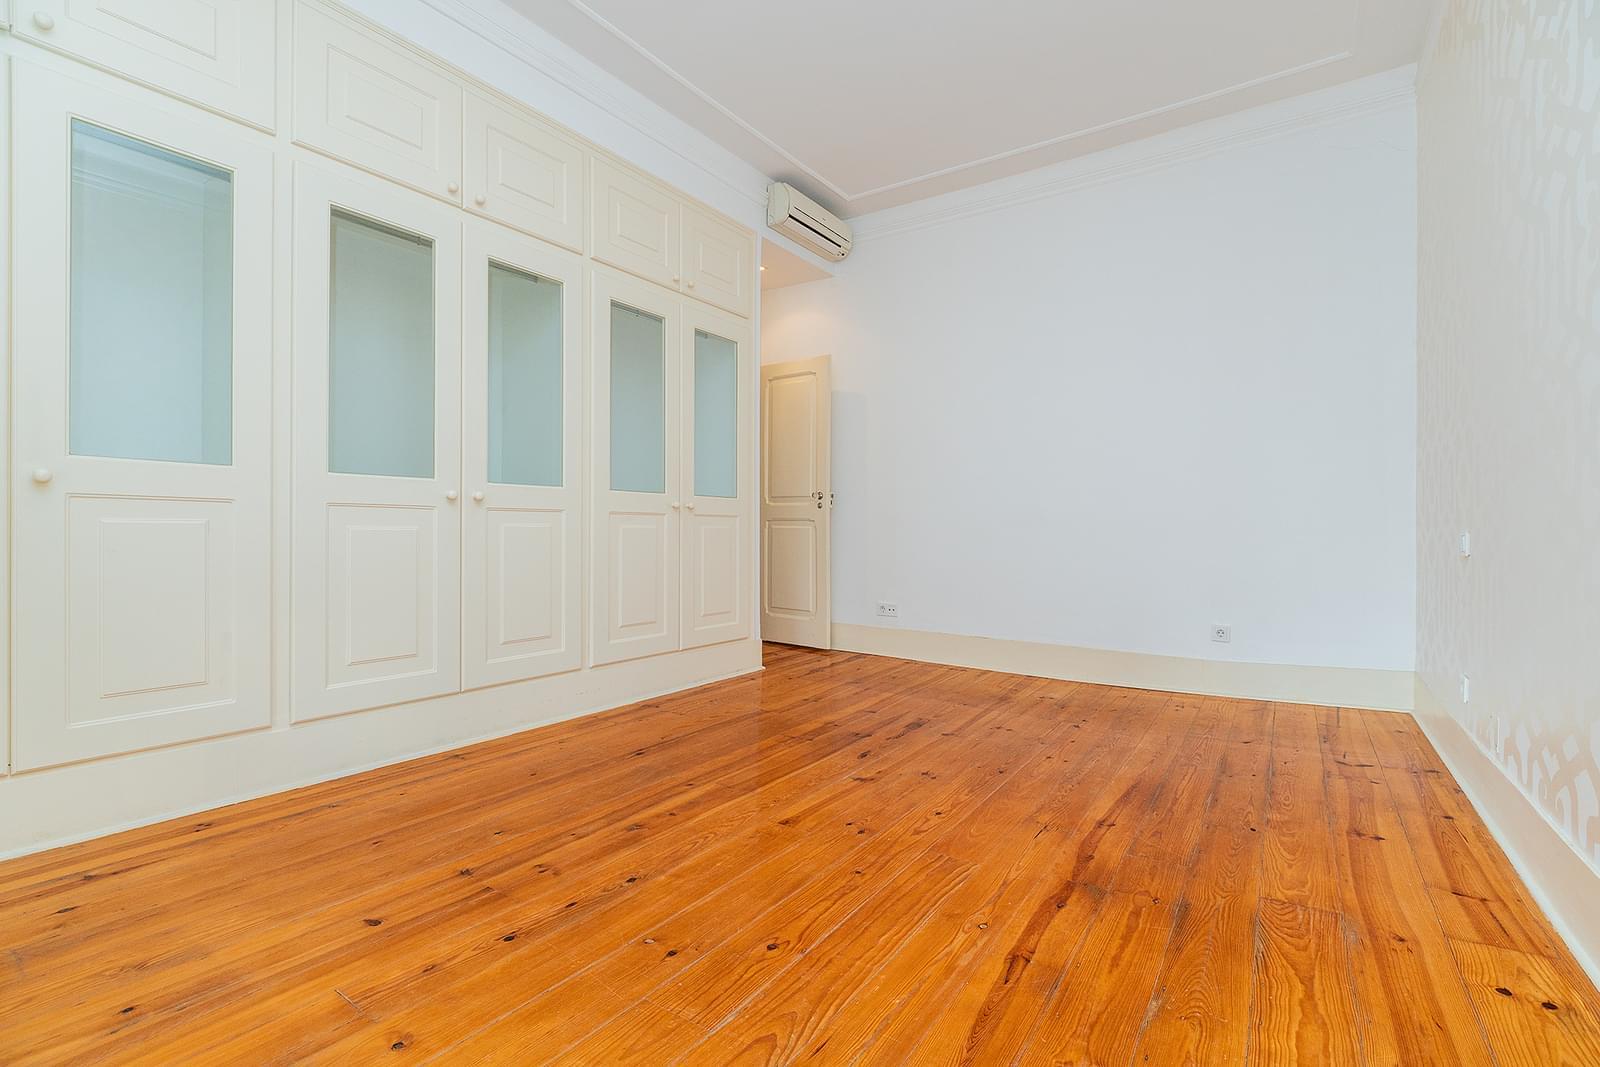 PF18723, Apartamento T3+1, LISBOA